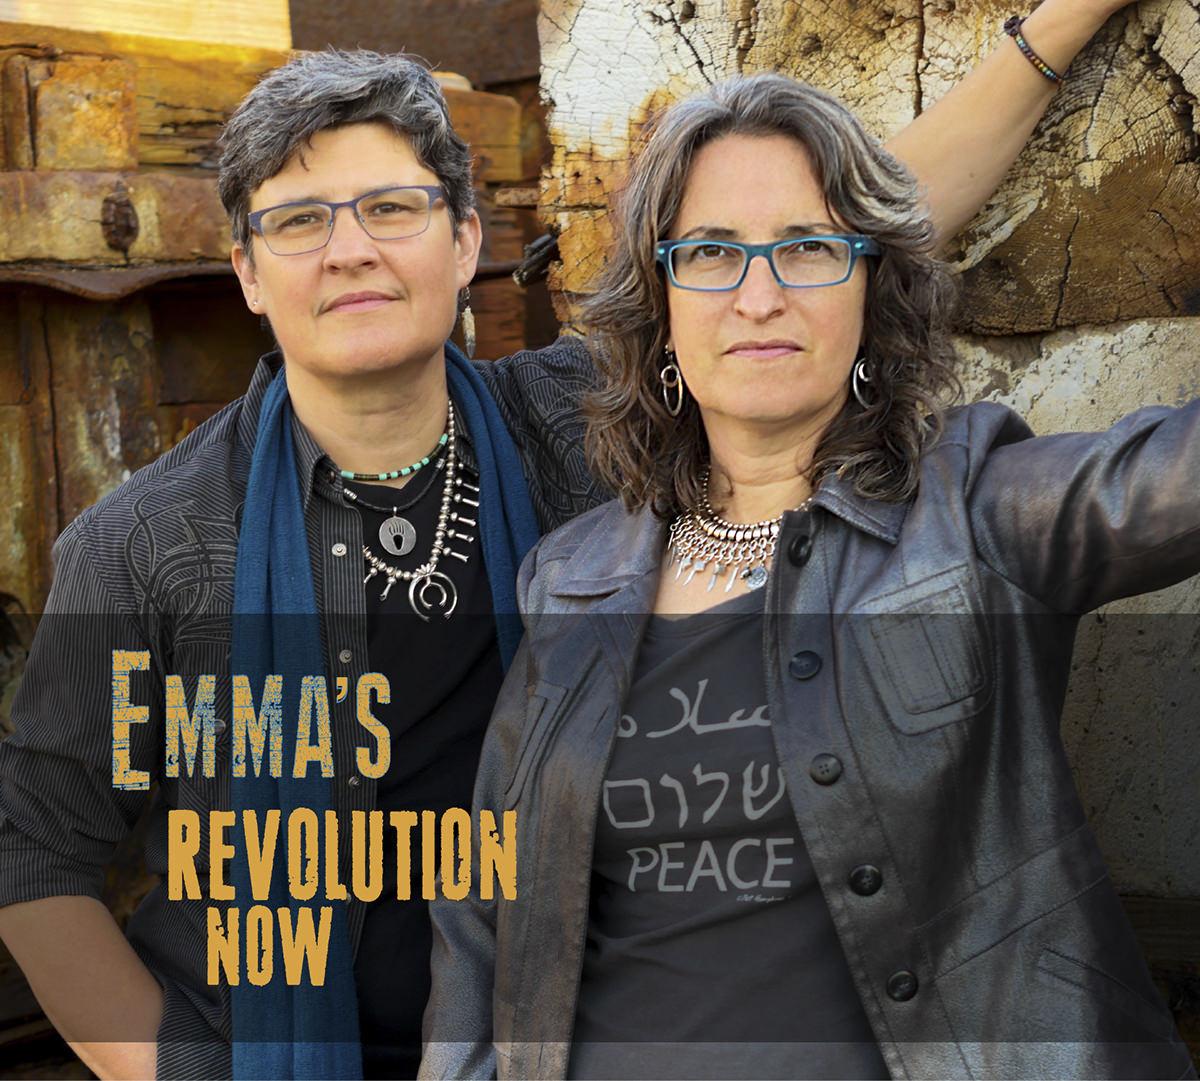 Emma's Revolution Now